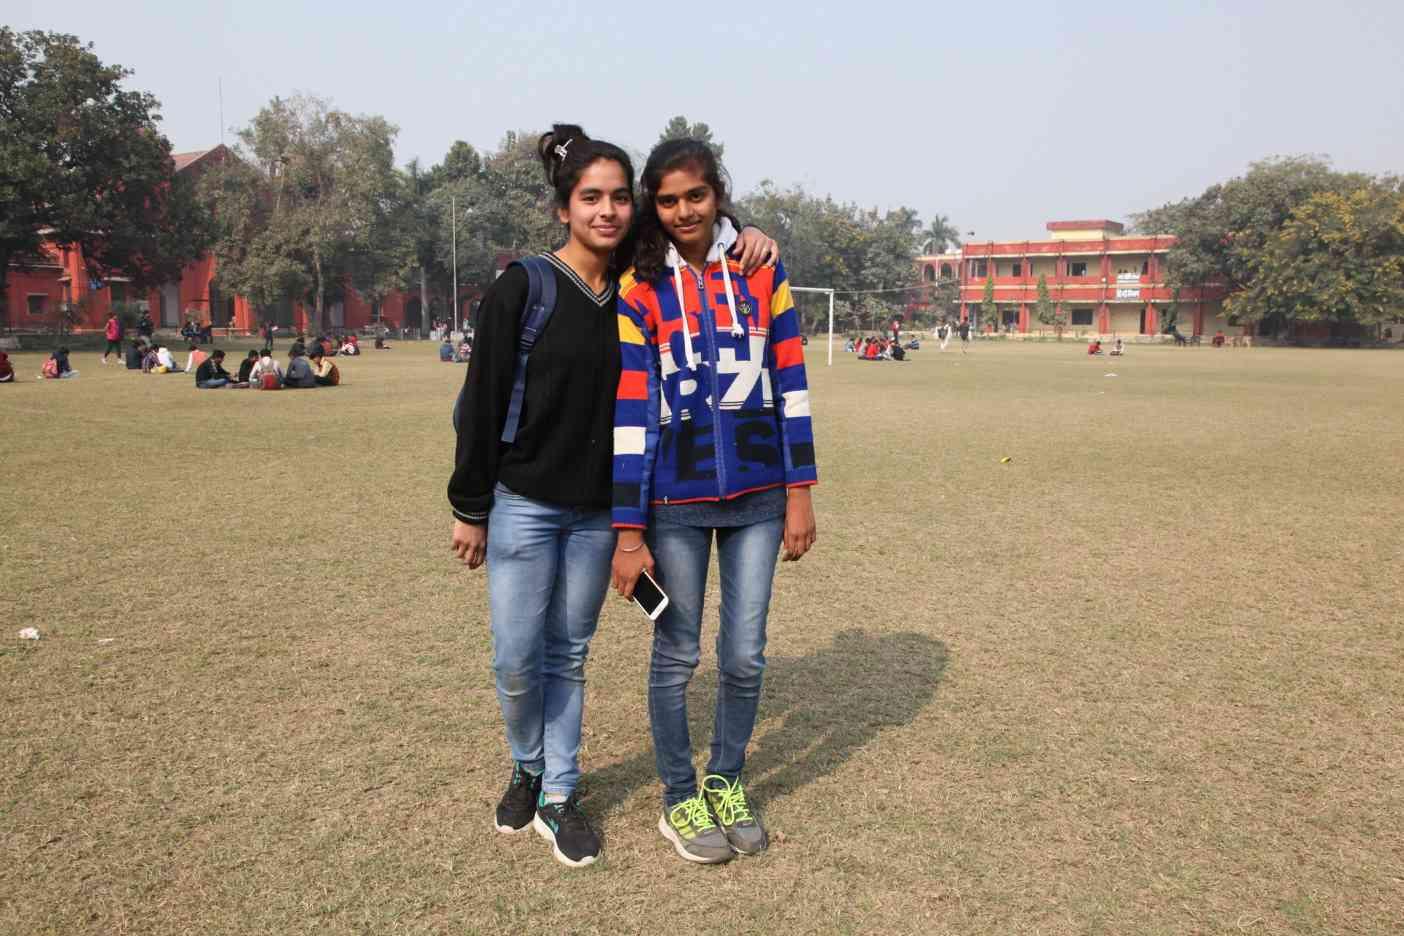 Rashmi Singh (right) and Alqama Zaidi at the Bareilly college.